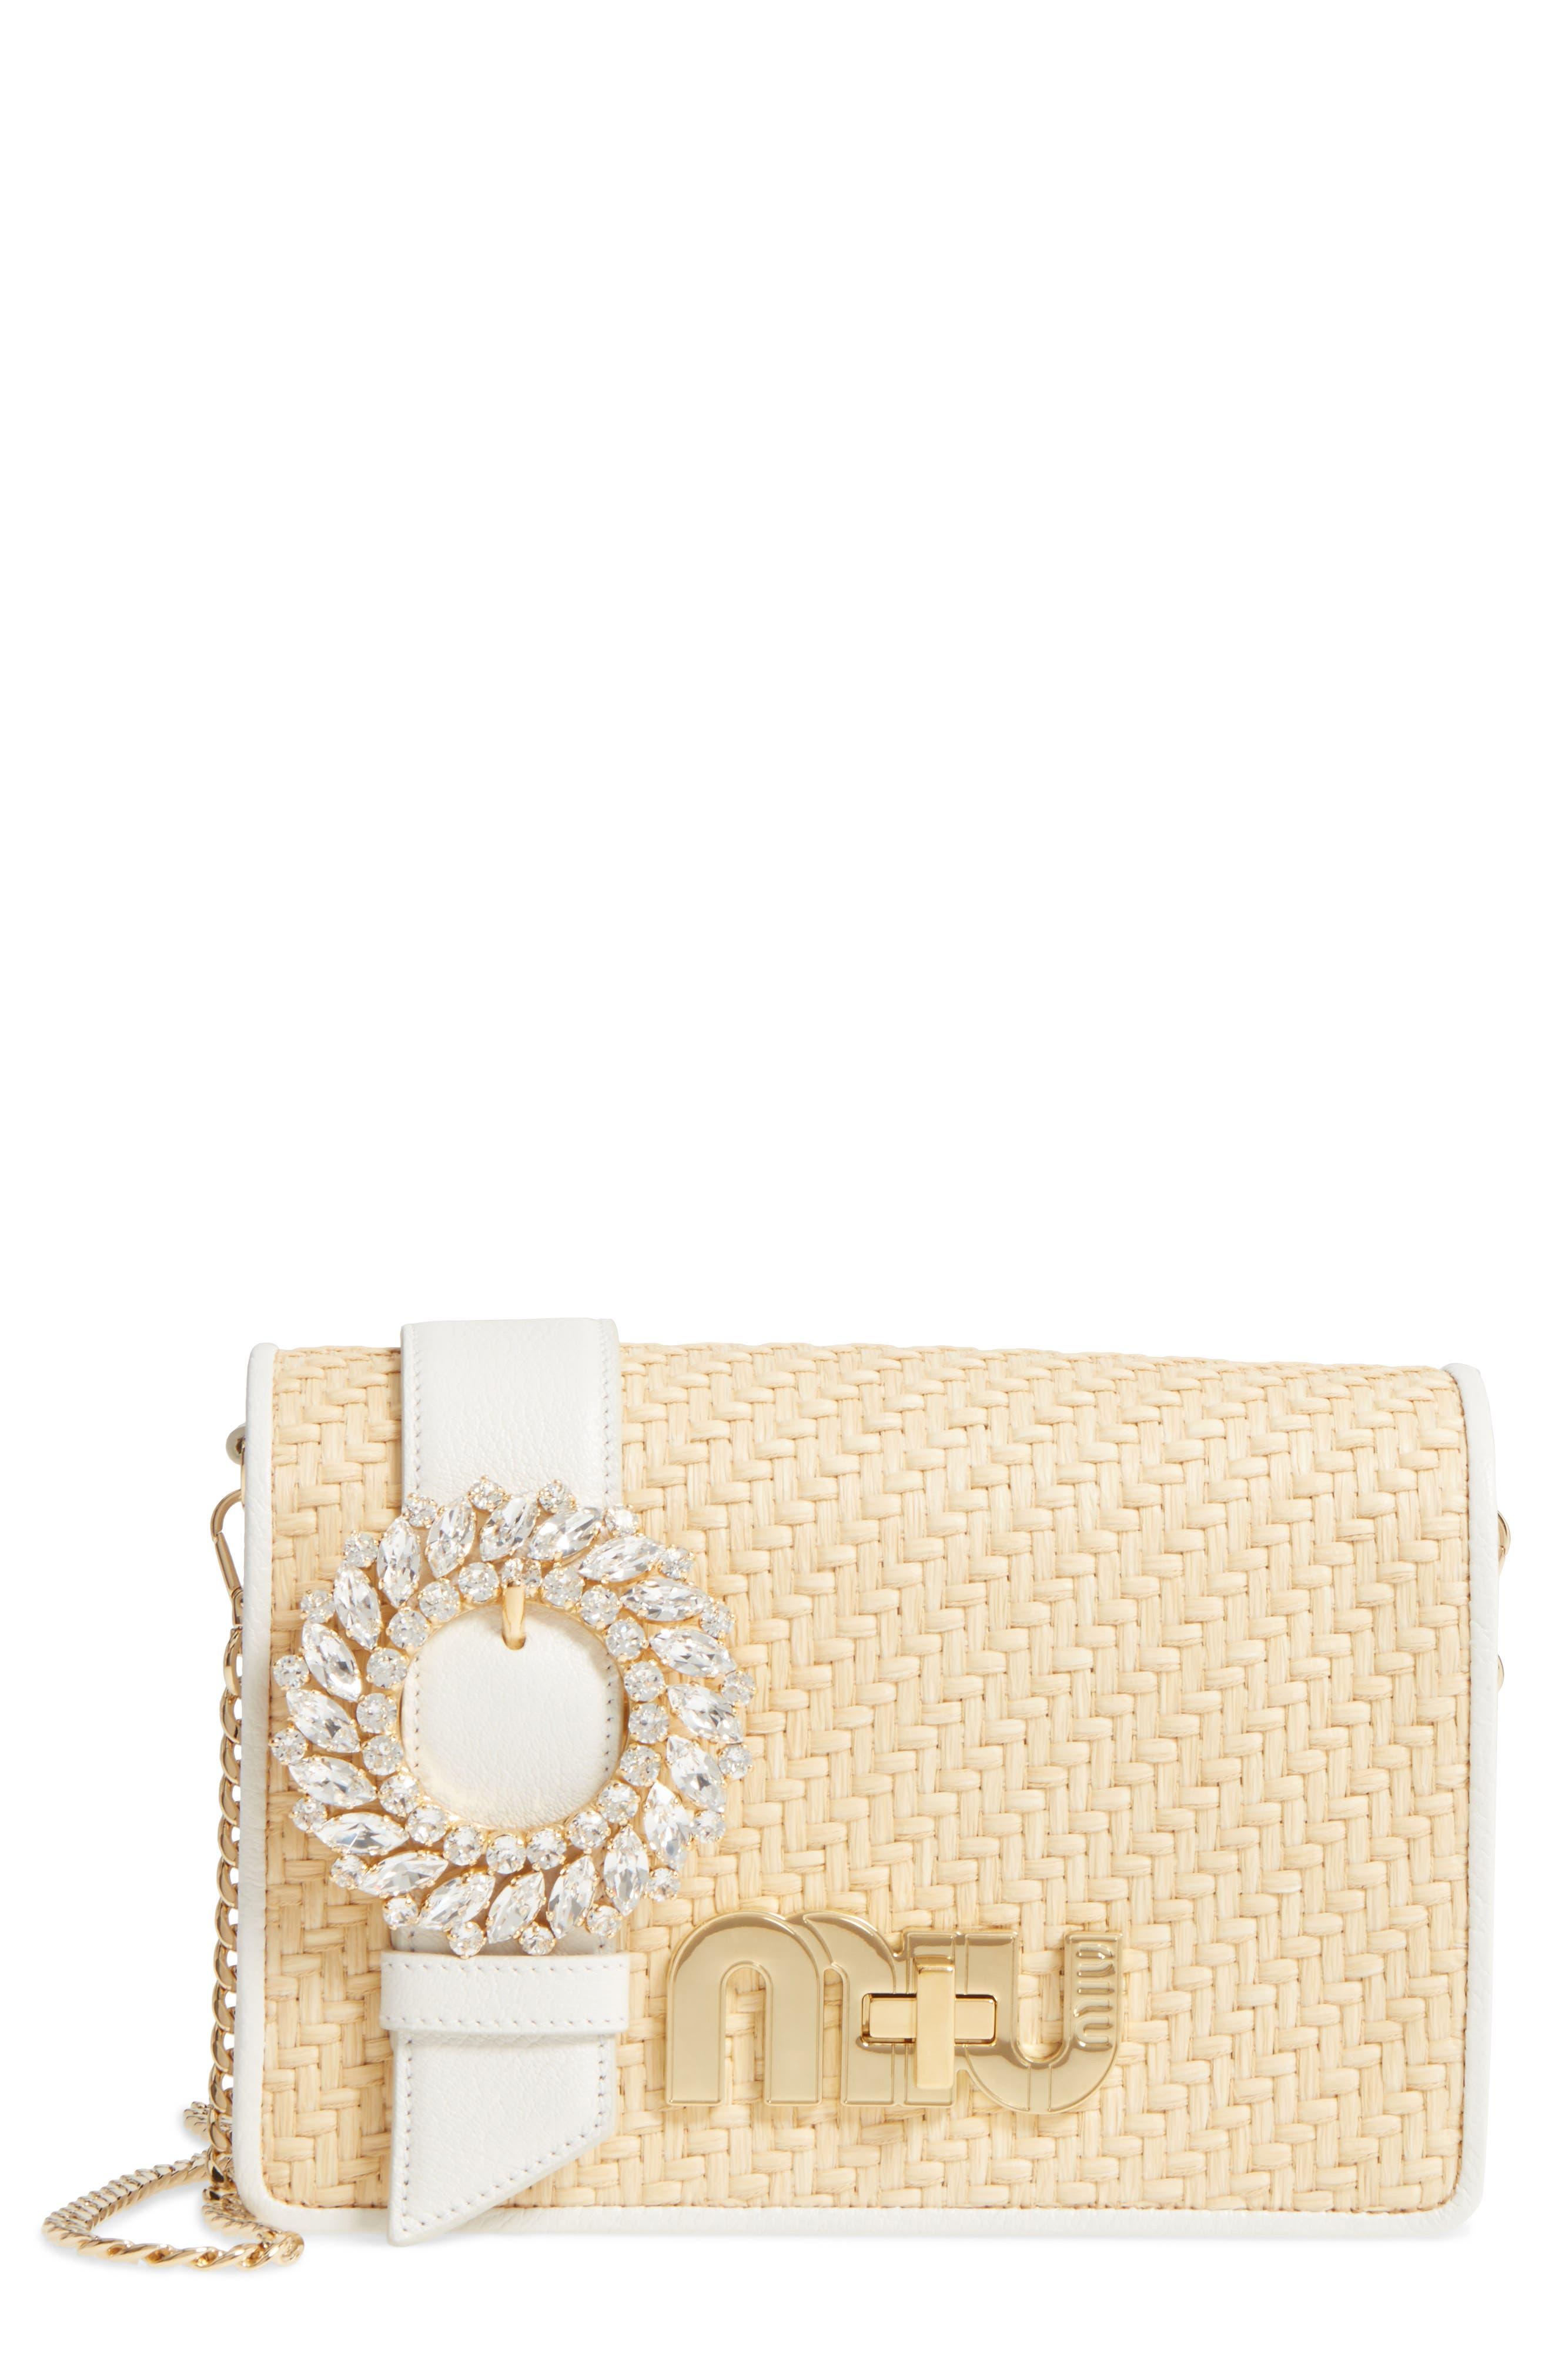 Woven Raffia & Leather Shoulder Bag,                             Main thumbnail 1, color,                             Naturale/ Bianco